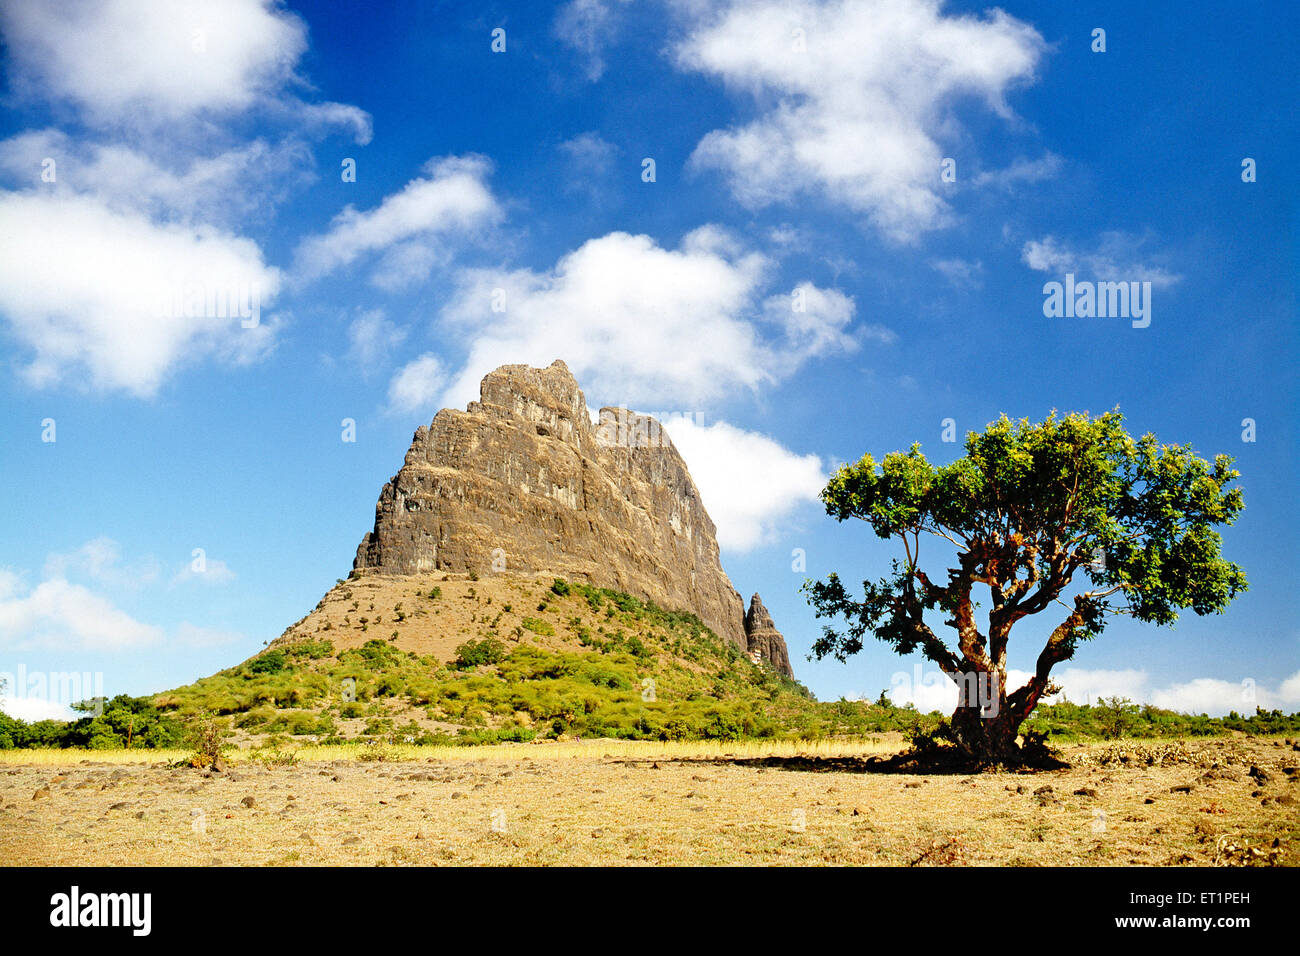 Agri search ind pvt ltd - Nasik (Nashik), India - Local ...